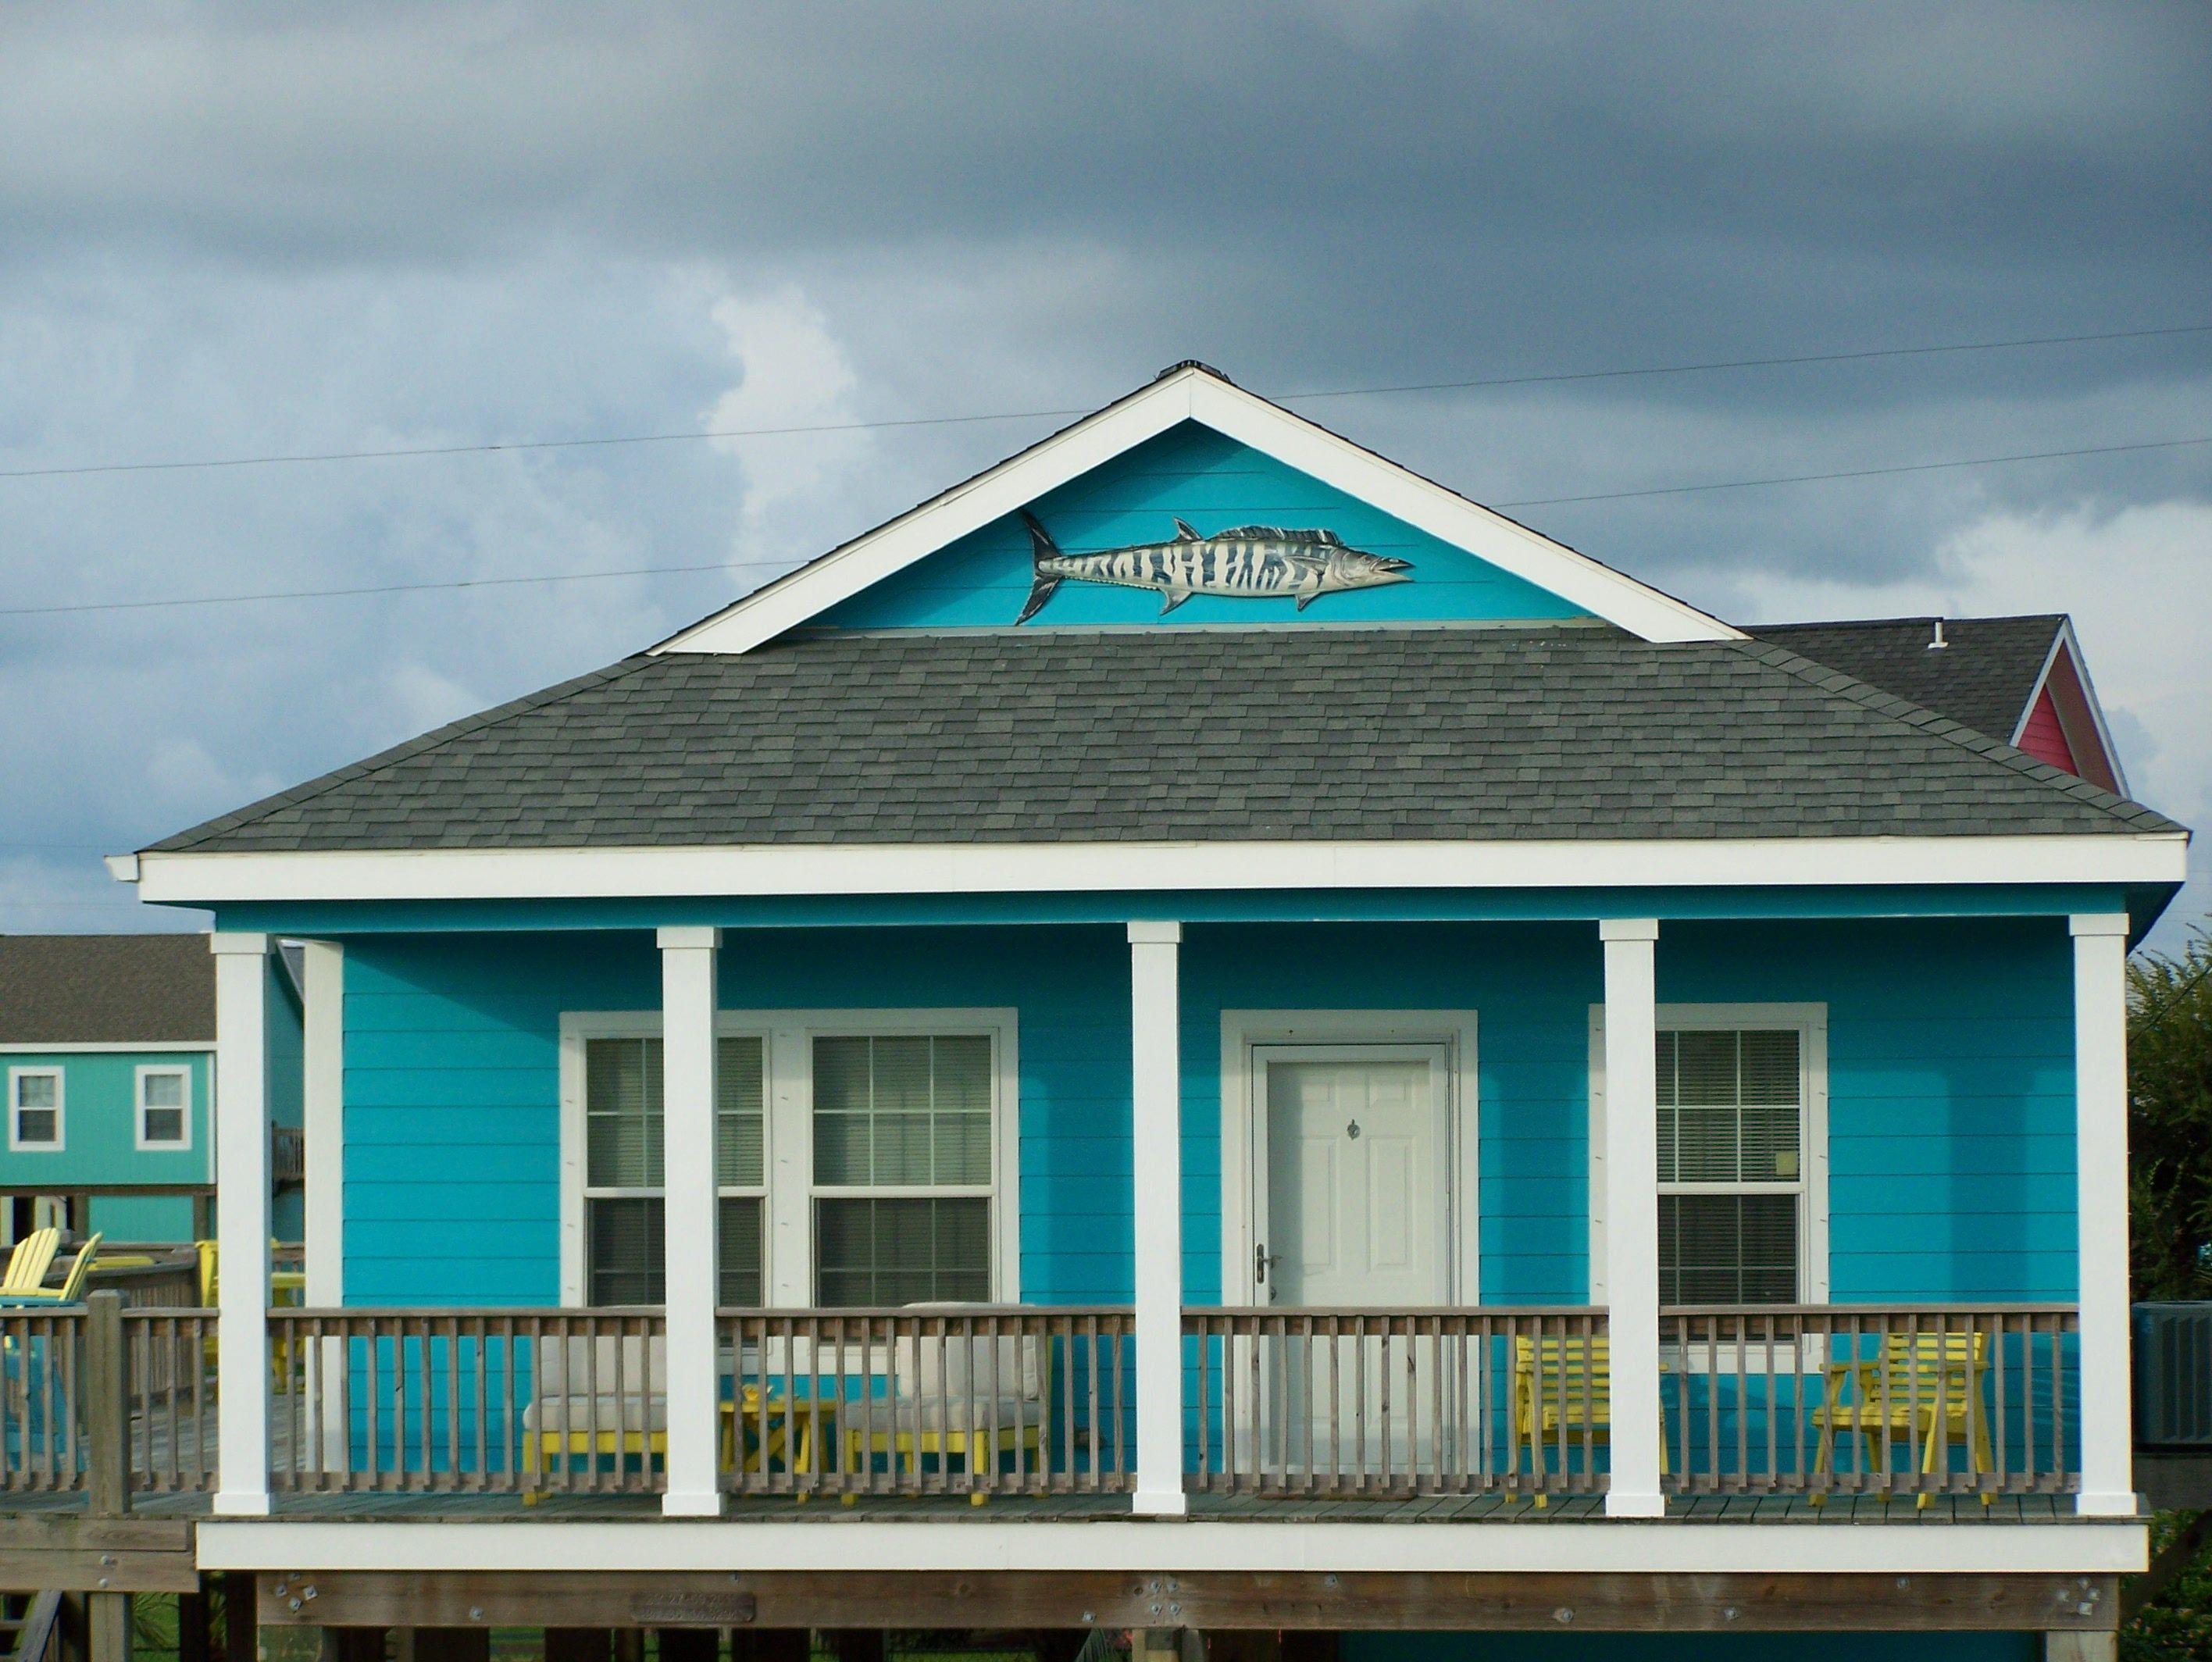 Sherwin williams basket beige exterior - New Paint Sherwin Williams Calypso Blue